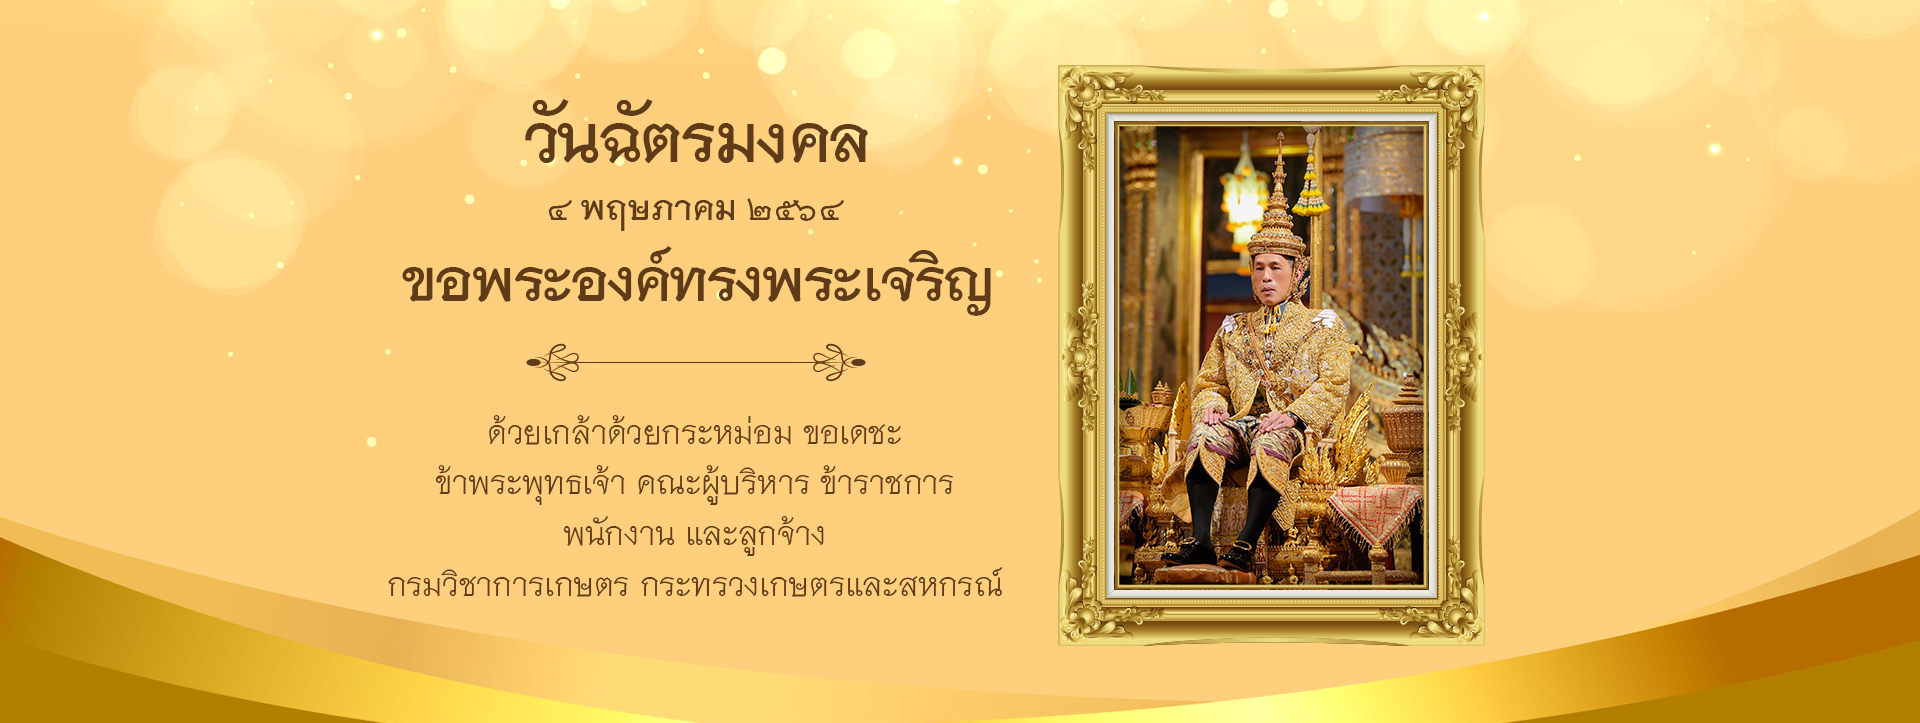 Coronation-Day2021-fb